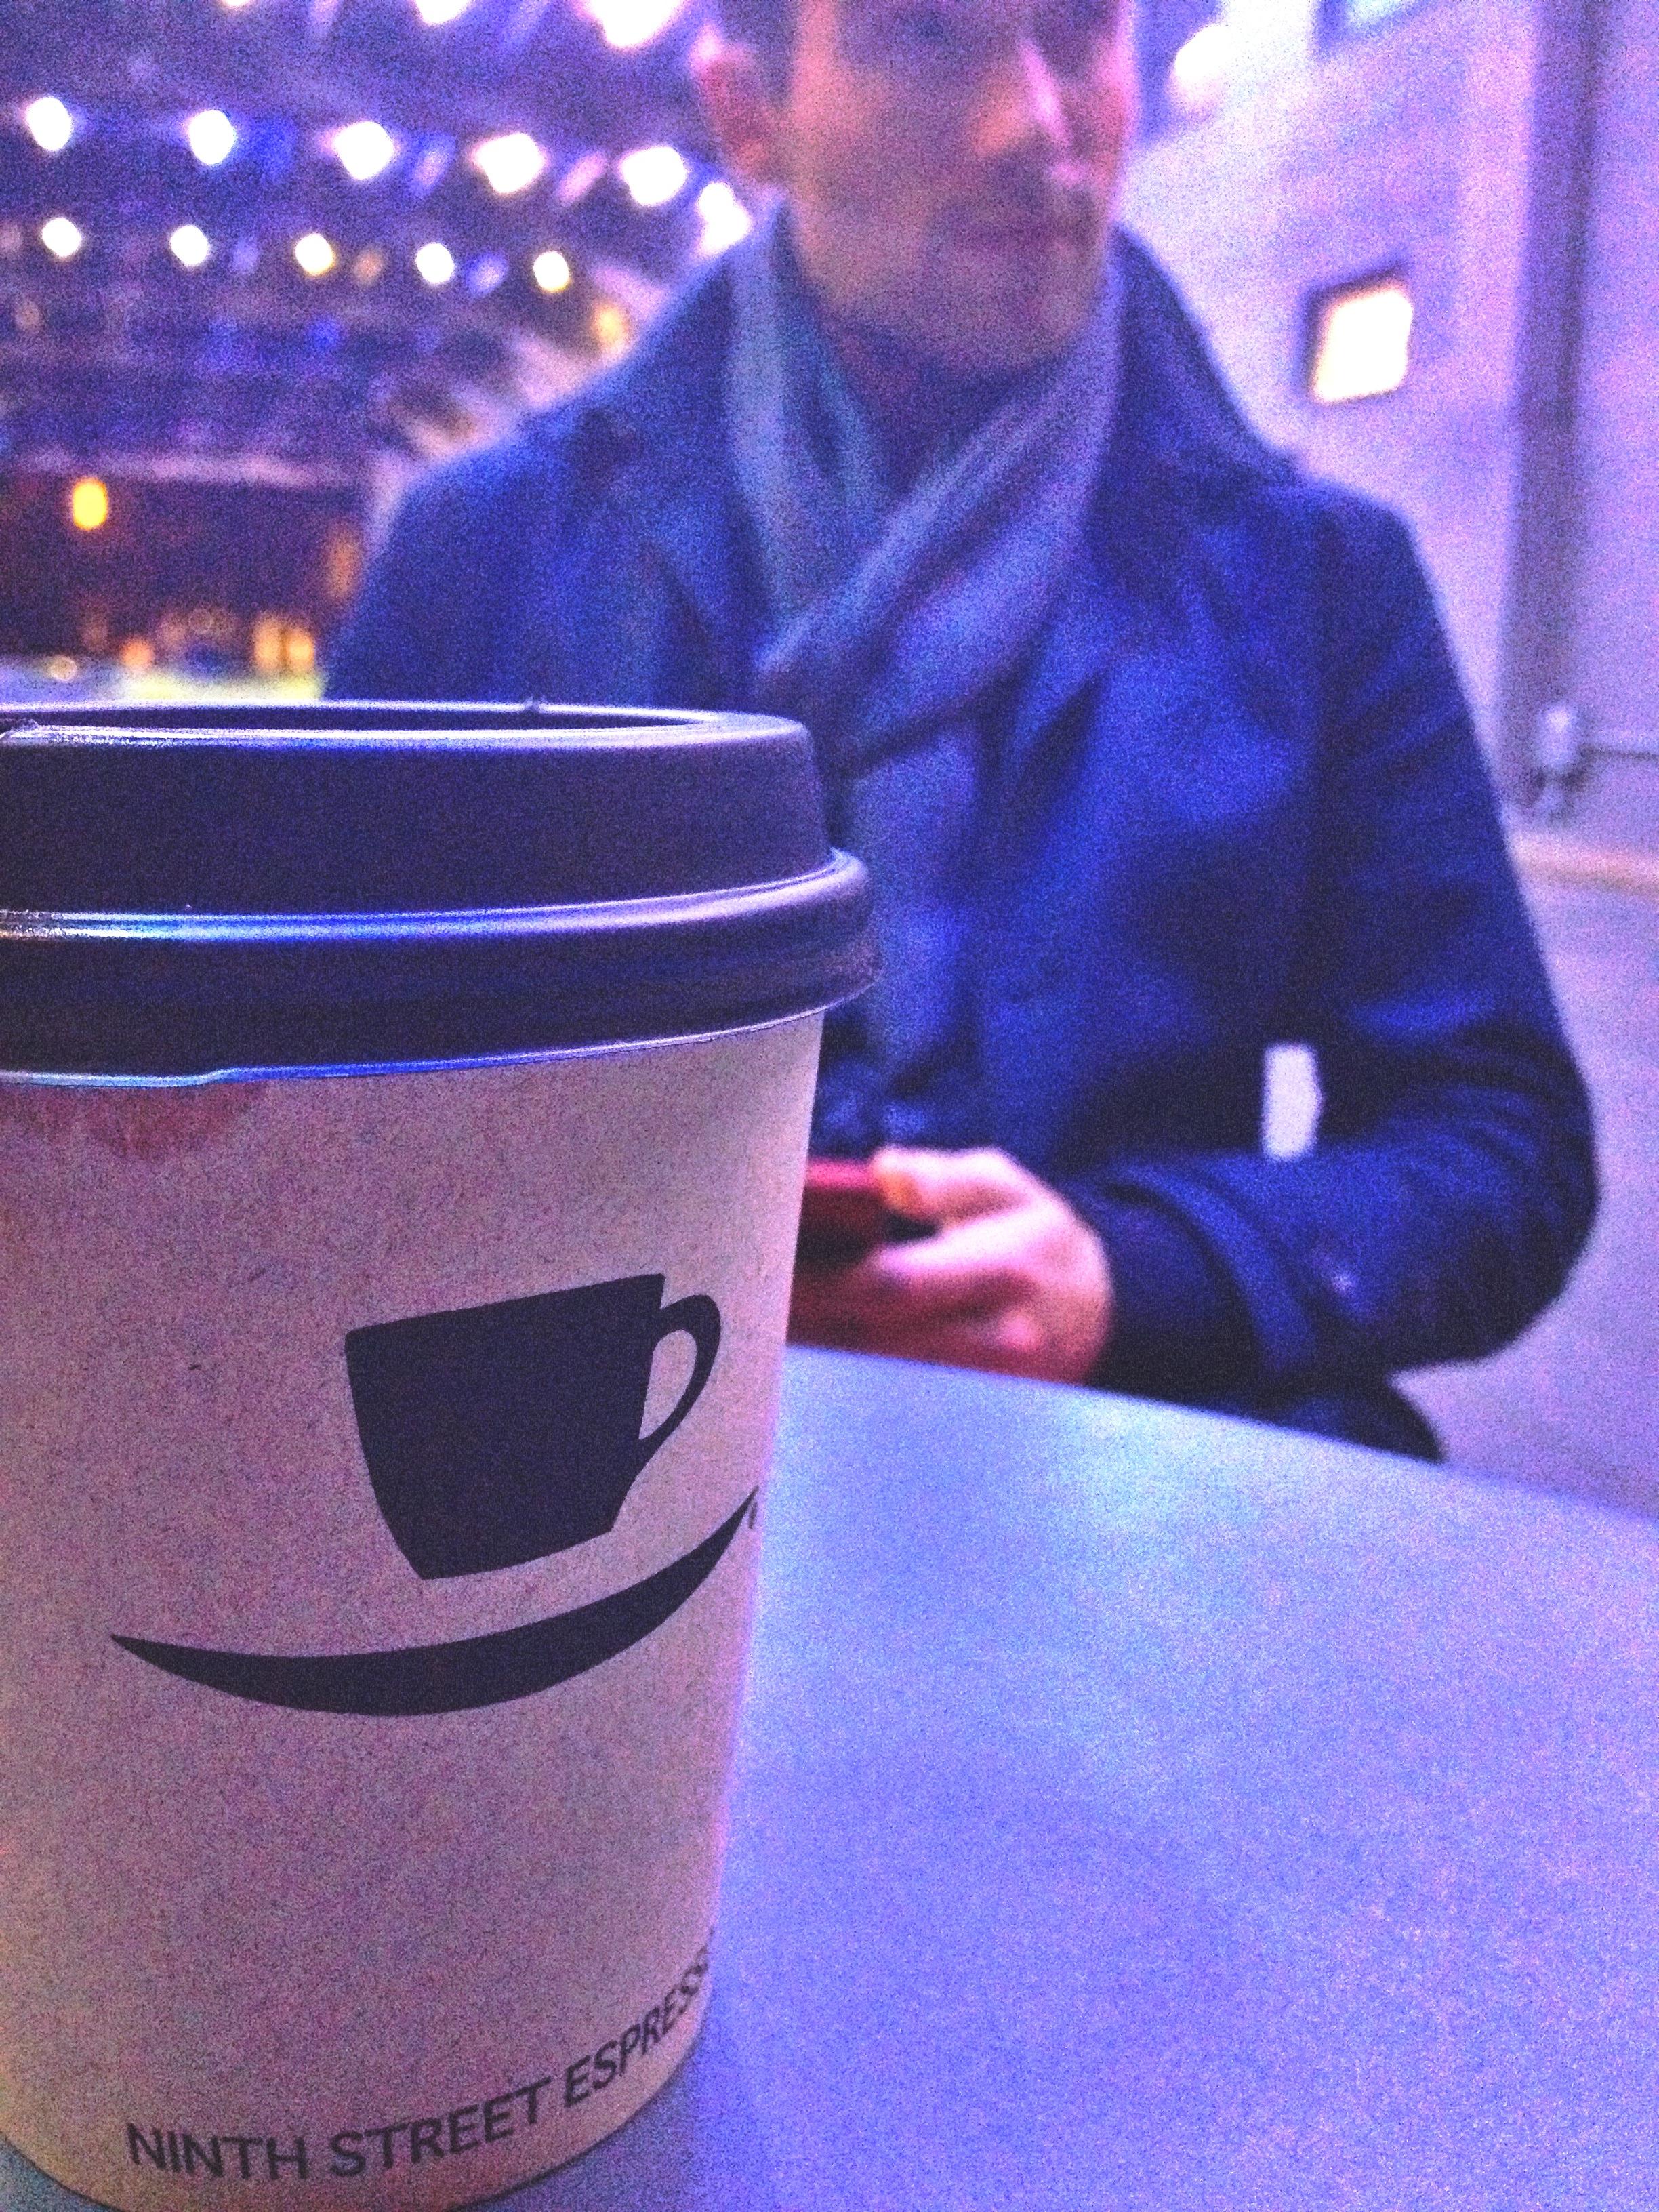 ninthstreetespresso.JPG